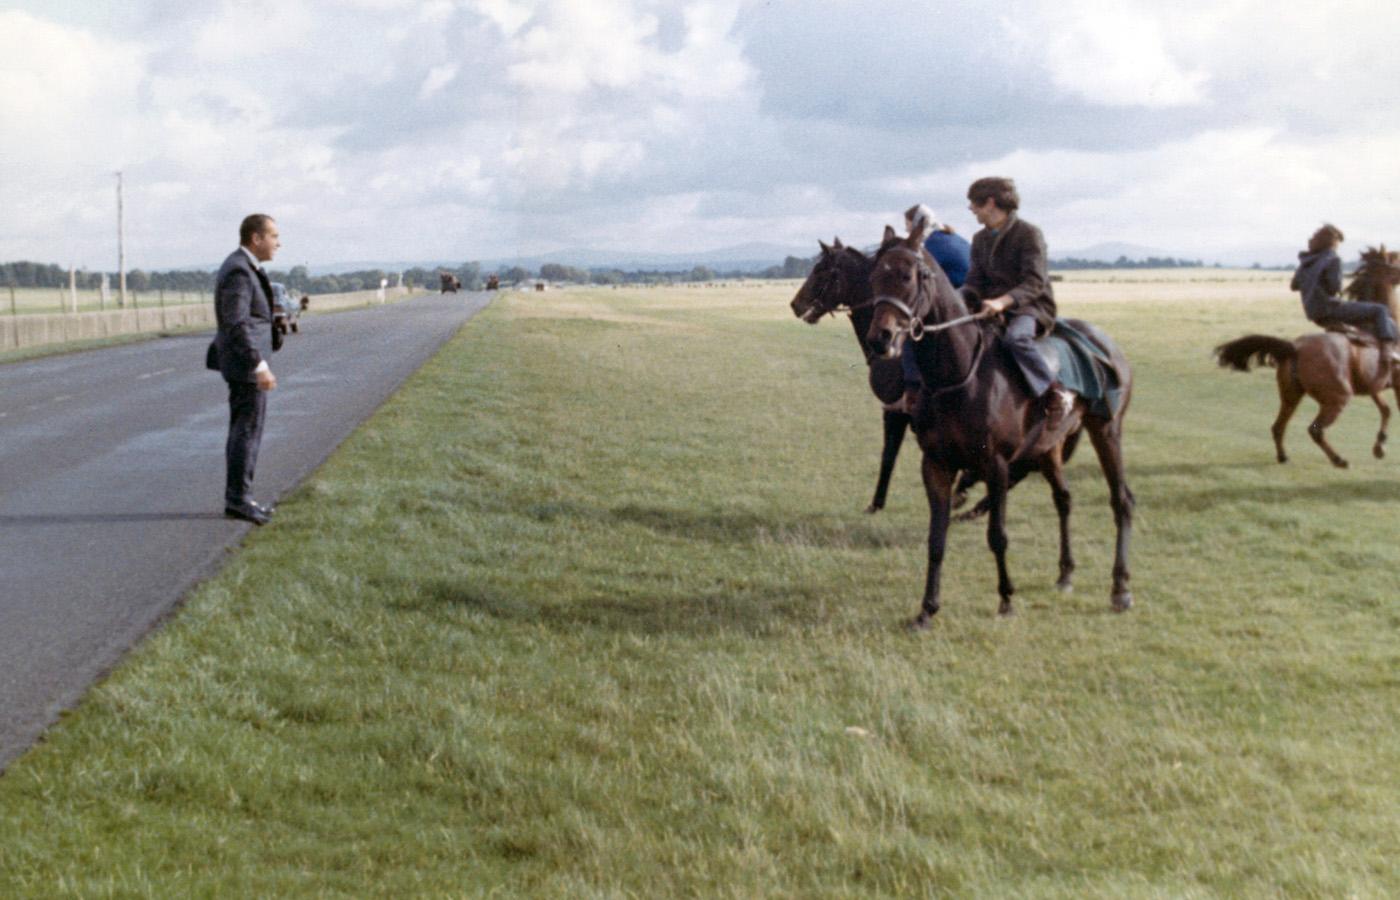 Richard Nixon sees horses